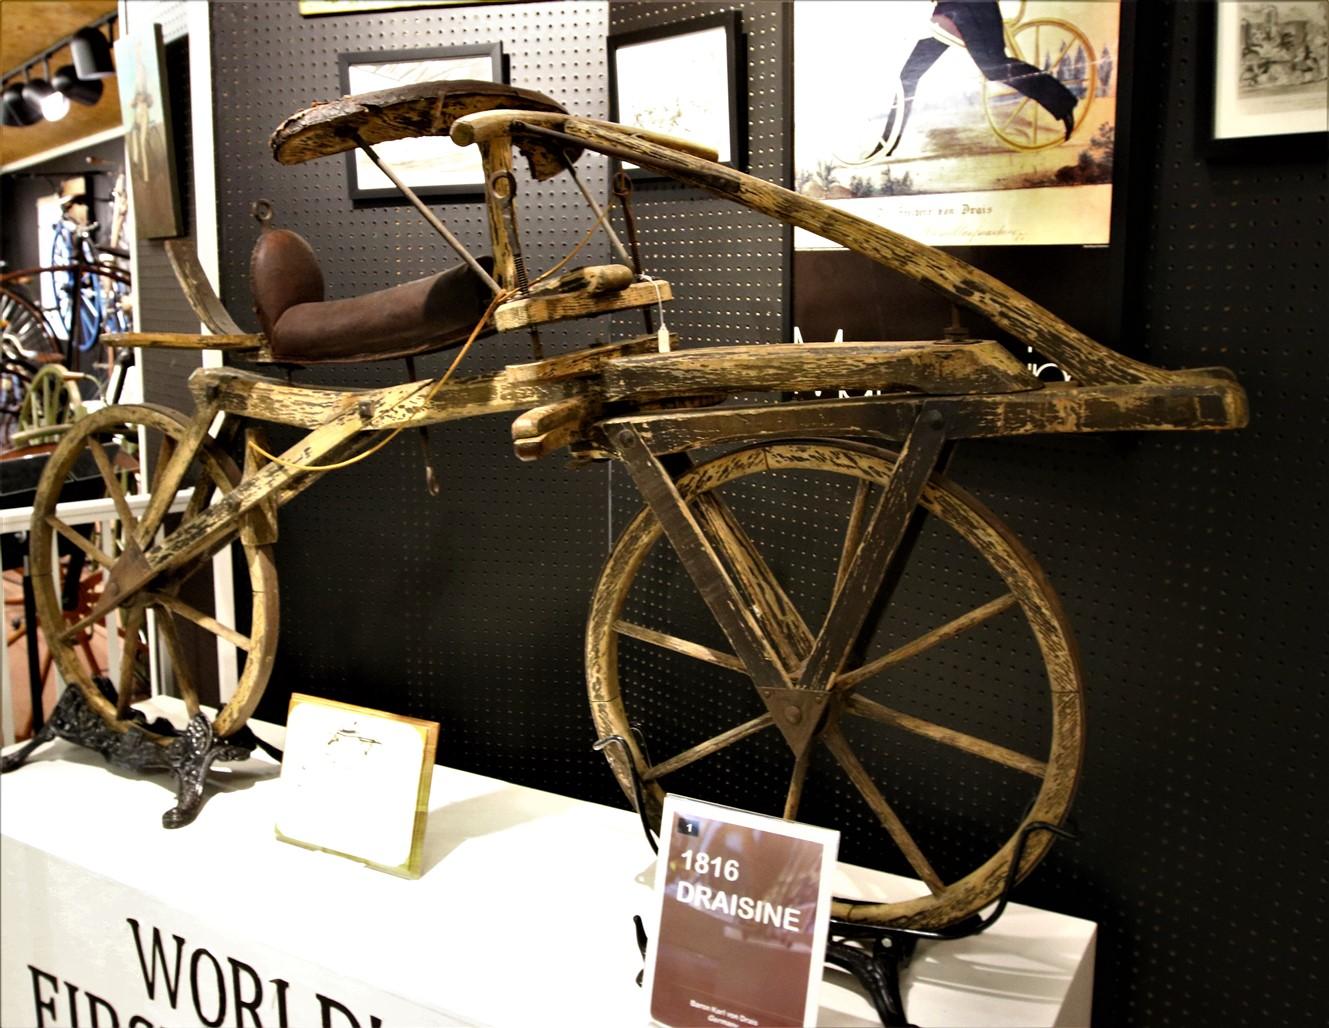 2017 03 18 115 New Bremen OH Bicycle Museum of America.jpg